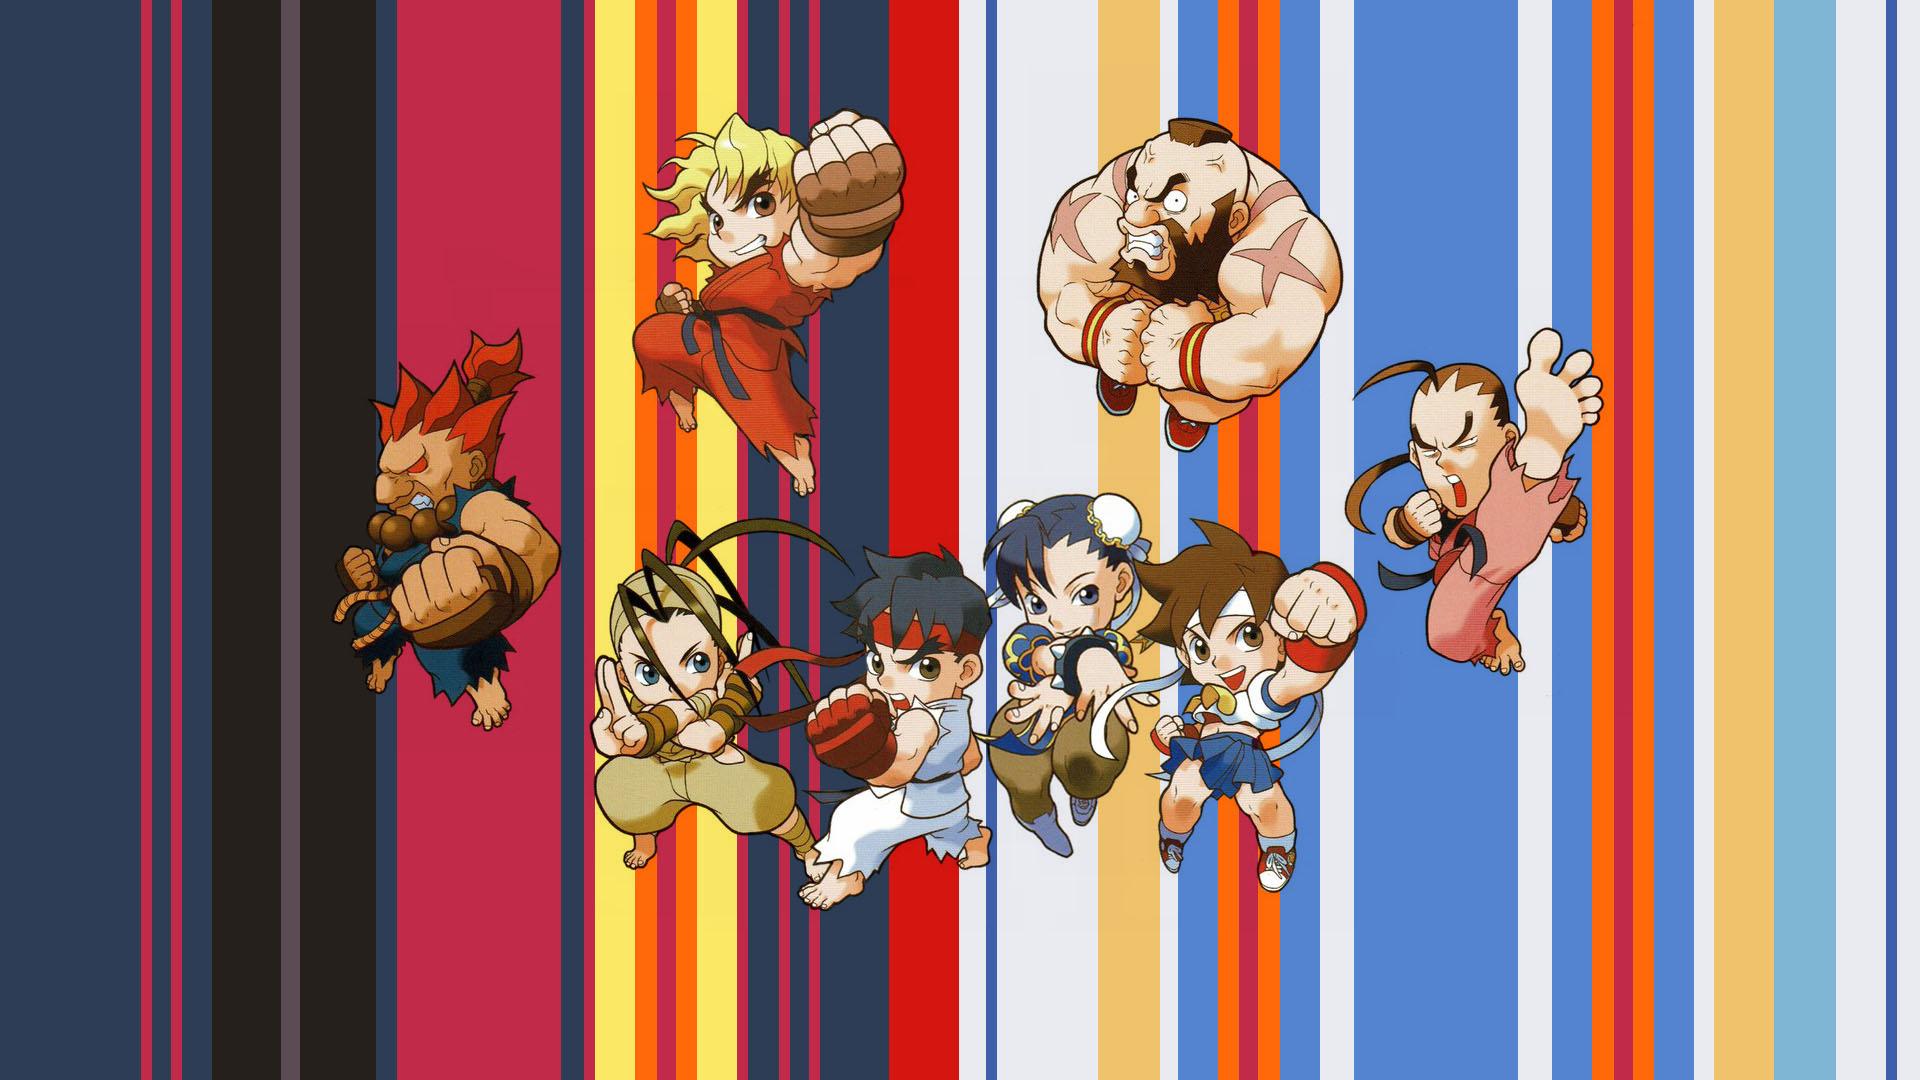 Wallpaper Street Fighter Games Art Ryu Street Fighter Chun Li